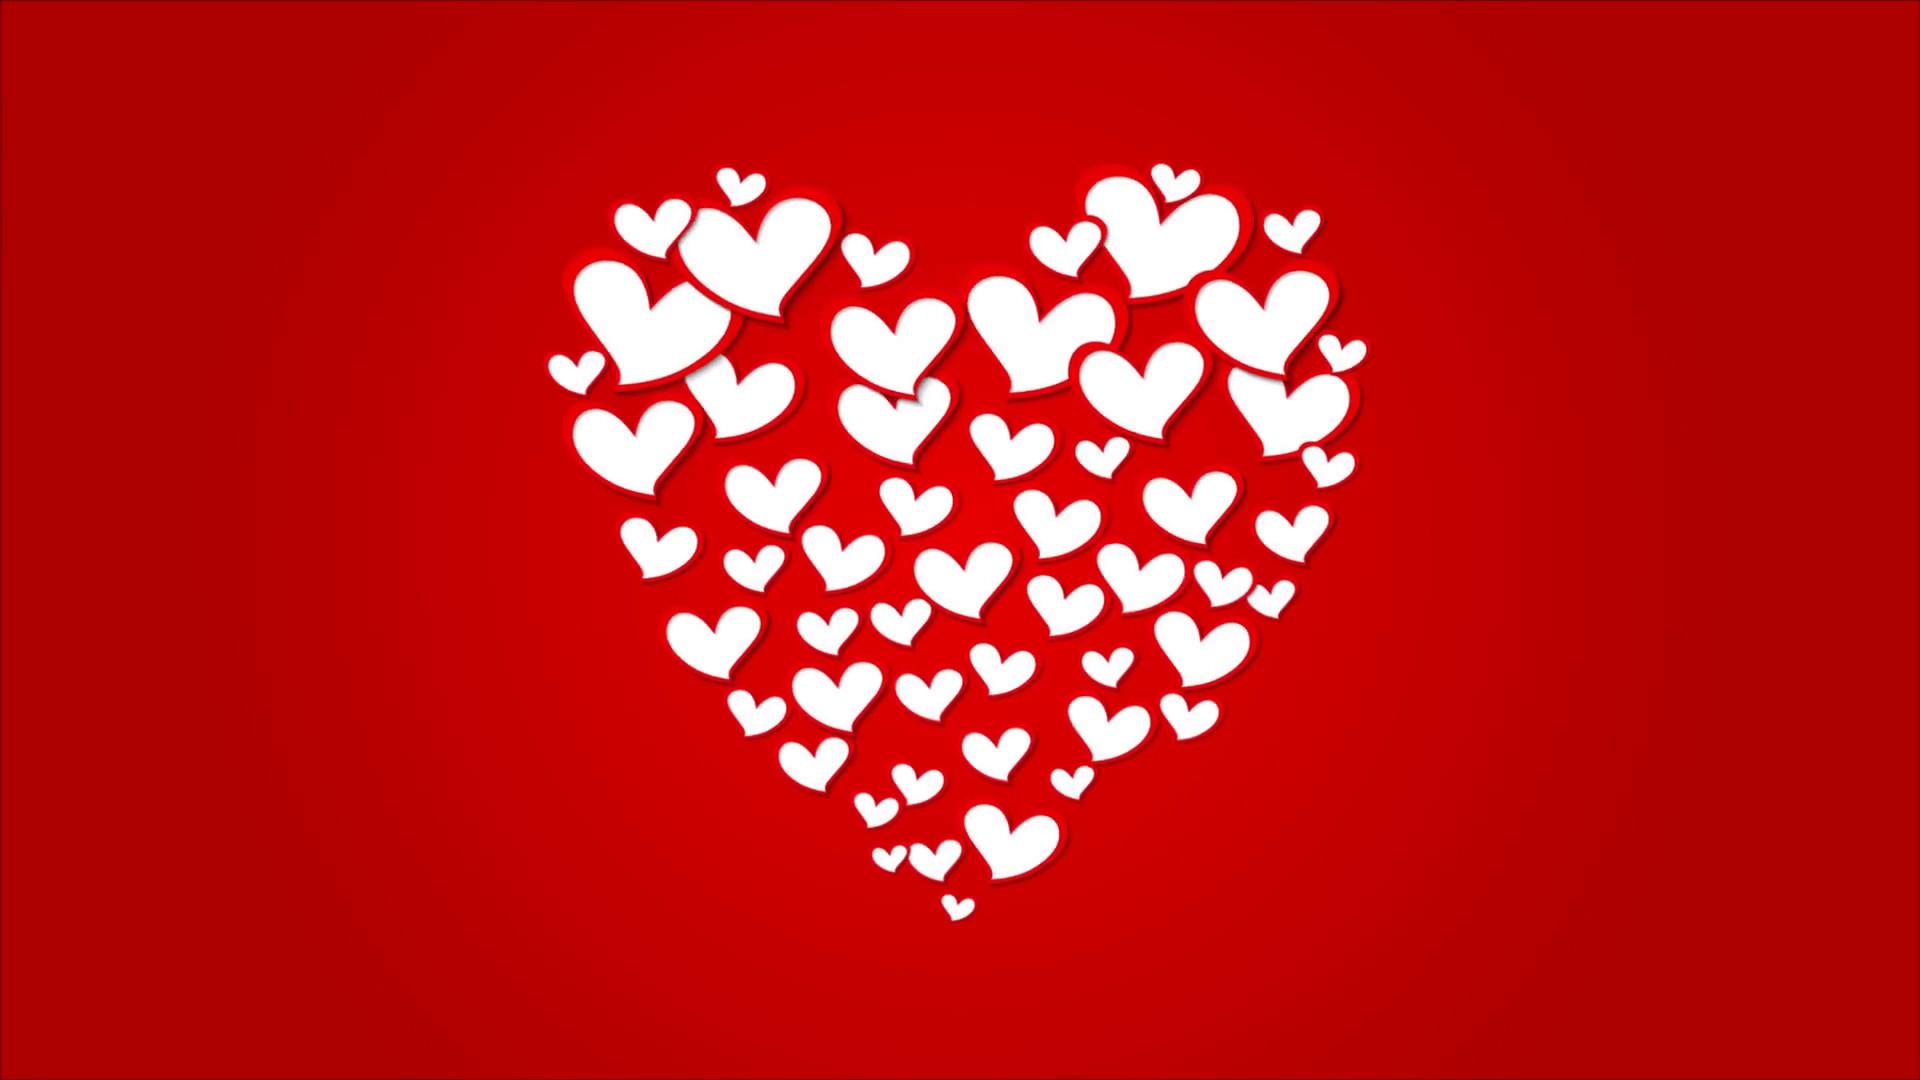 Valentine Day Background 46 Images